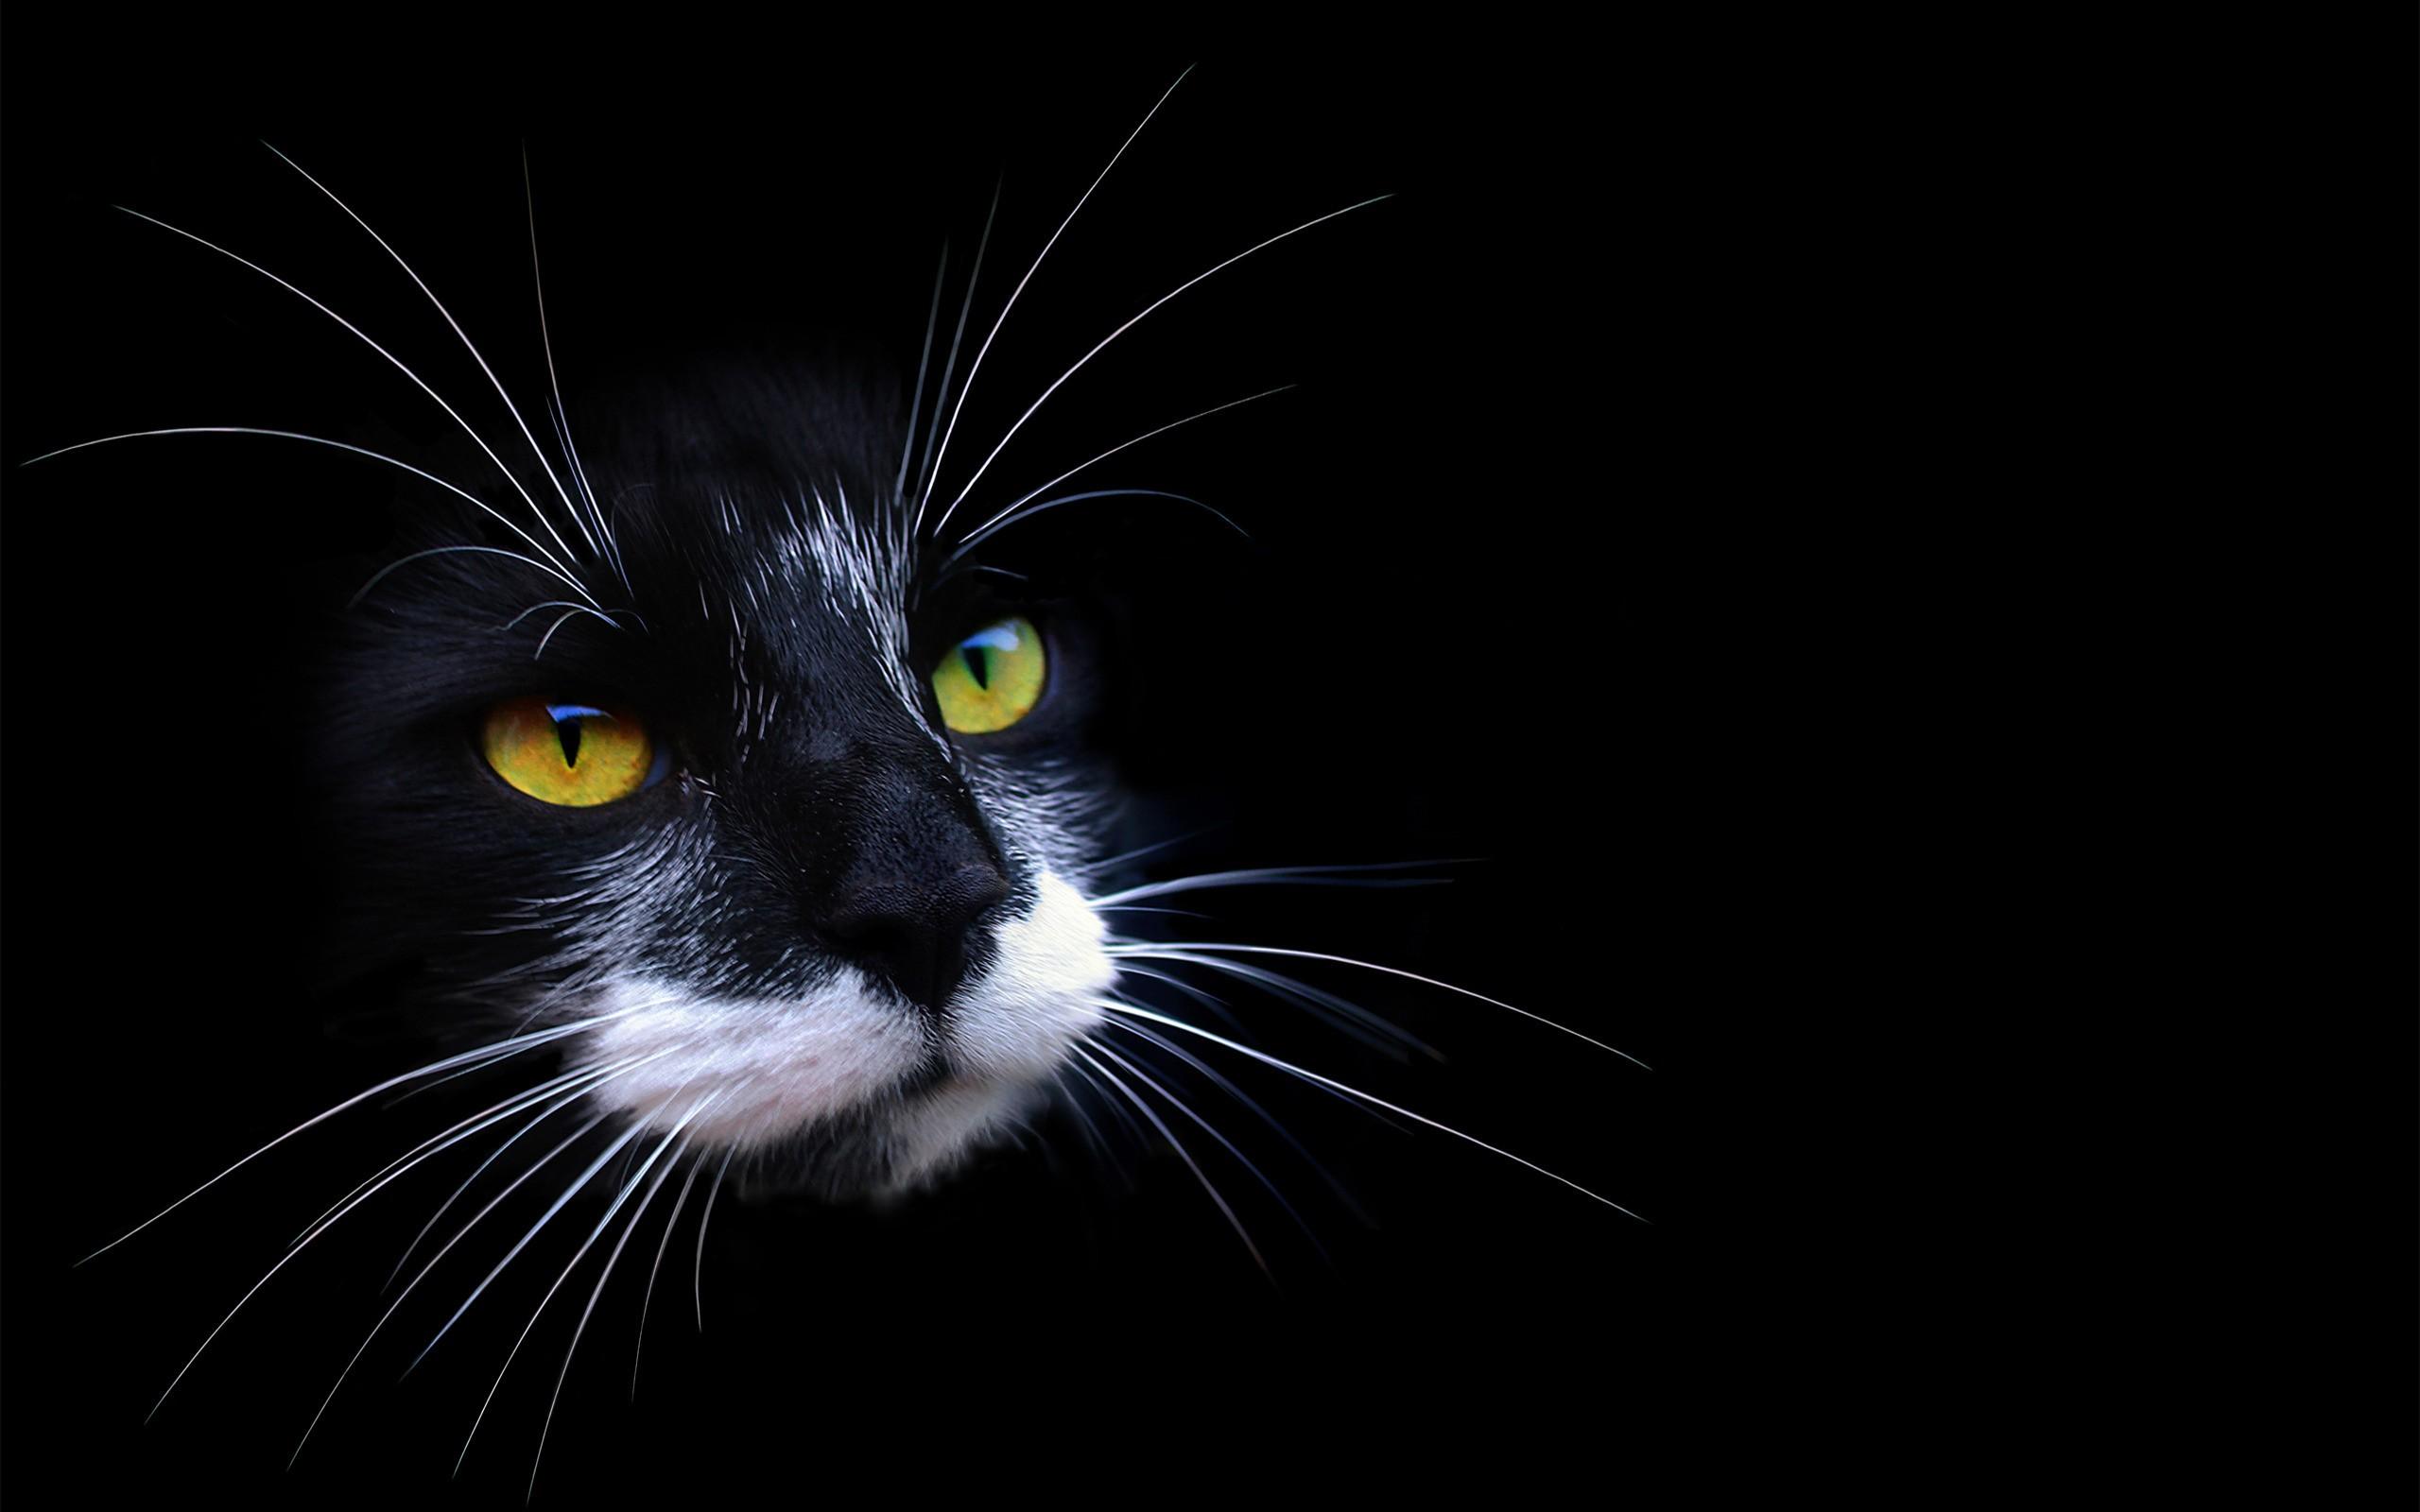 Gato y fondo negro - 2560x1600